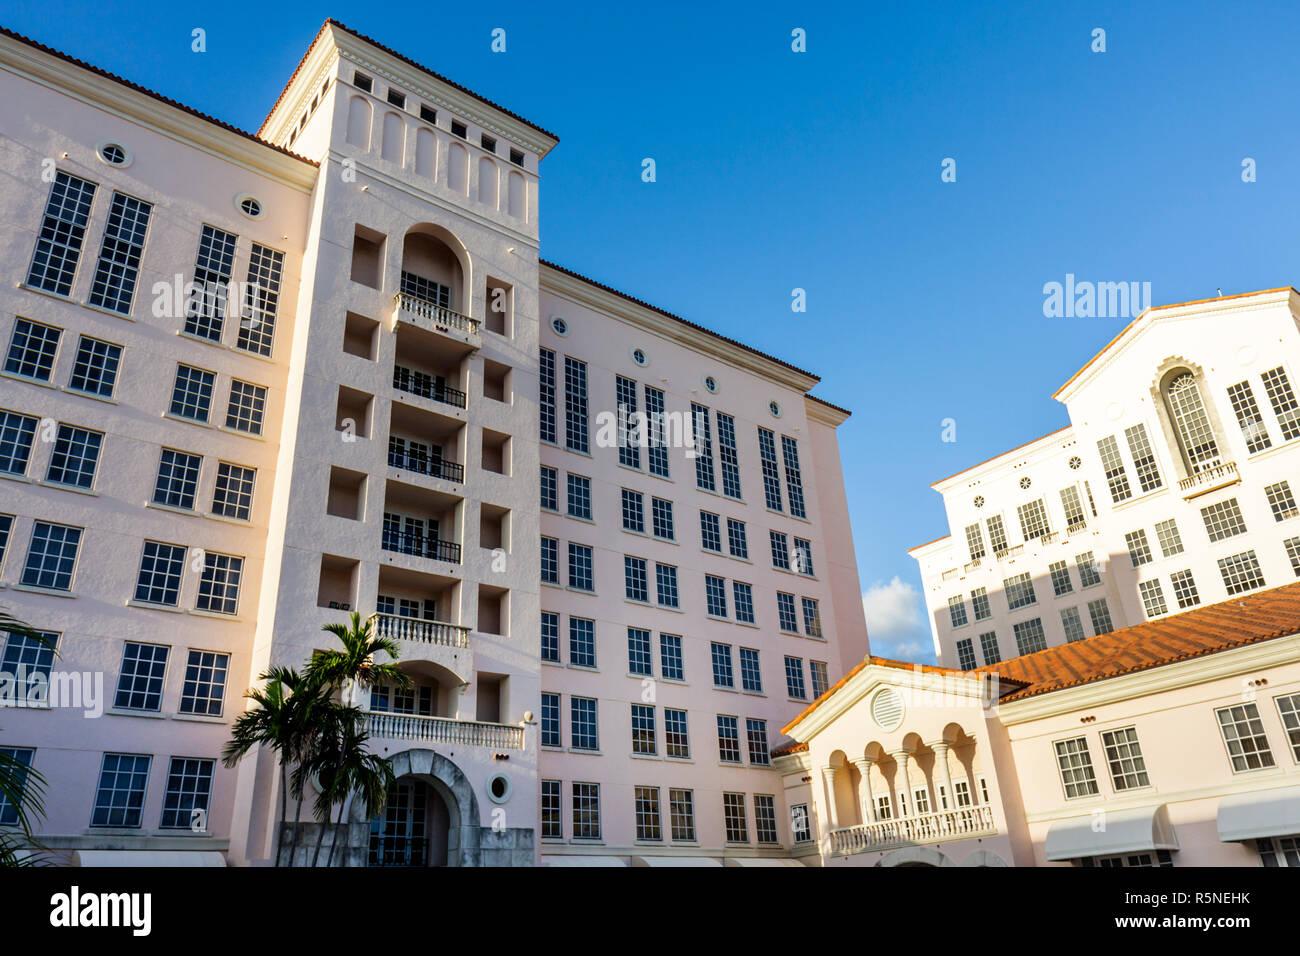 Florida, FL, South, Miami, Coral Gables, Hyatt Regency, chain, lodging, hotel hotels lodging inn motel motels, building, outside exterior, exterior, f Stock Photo